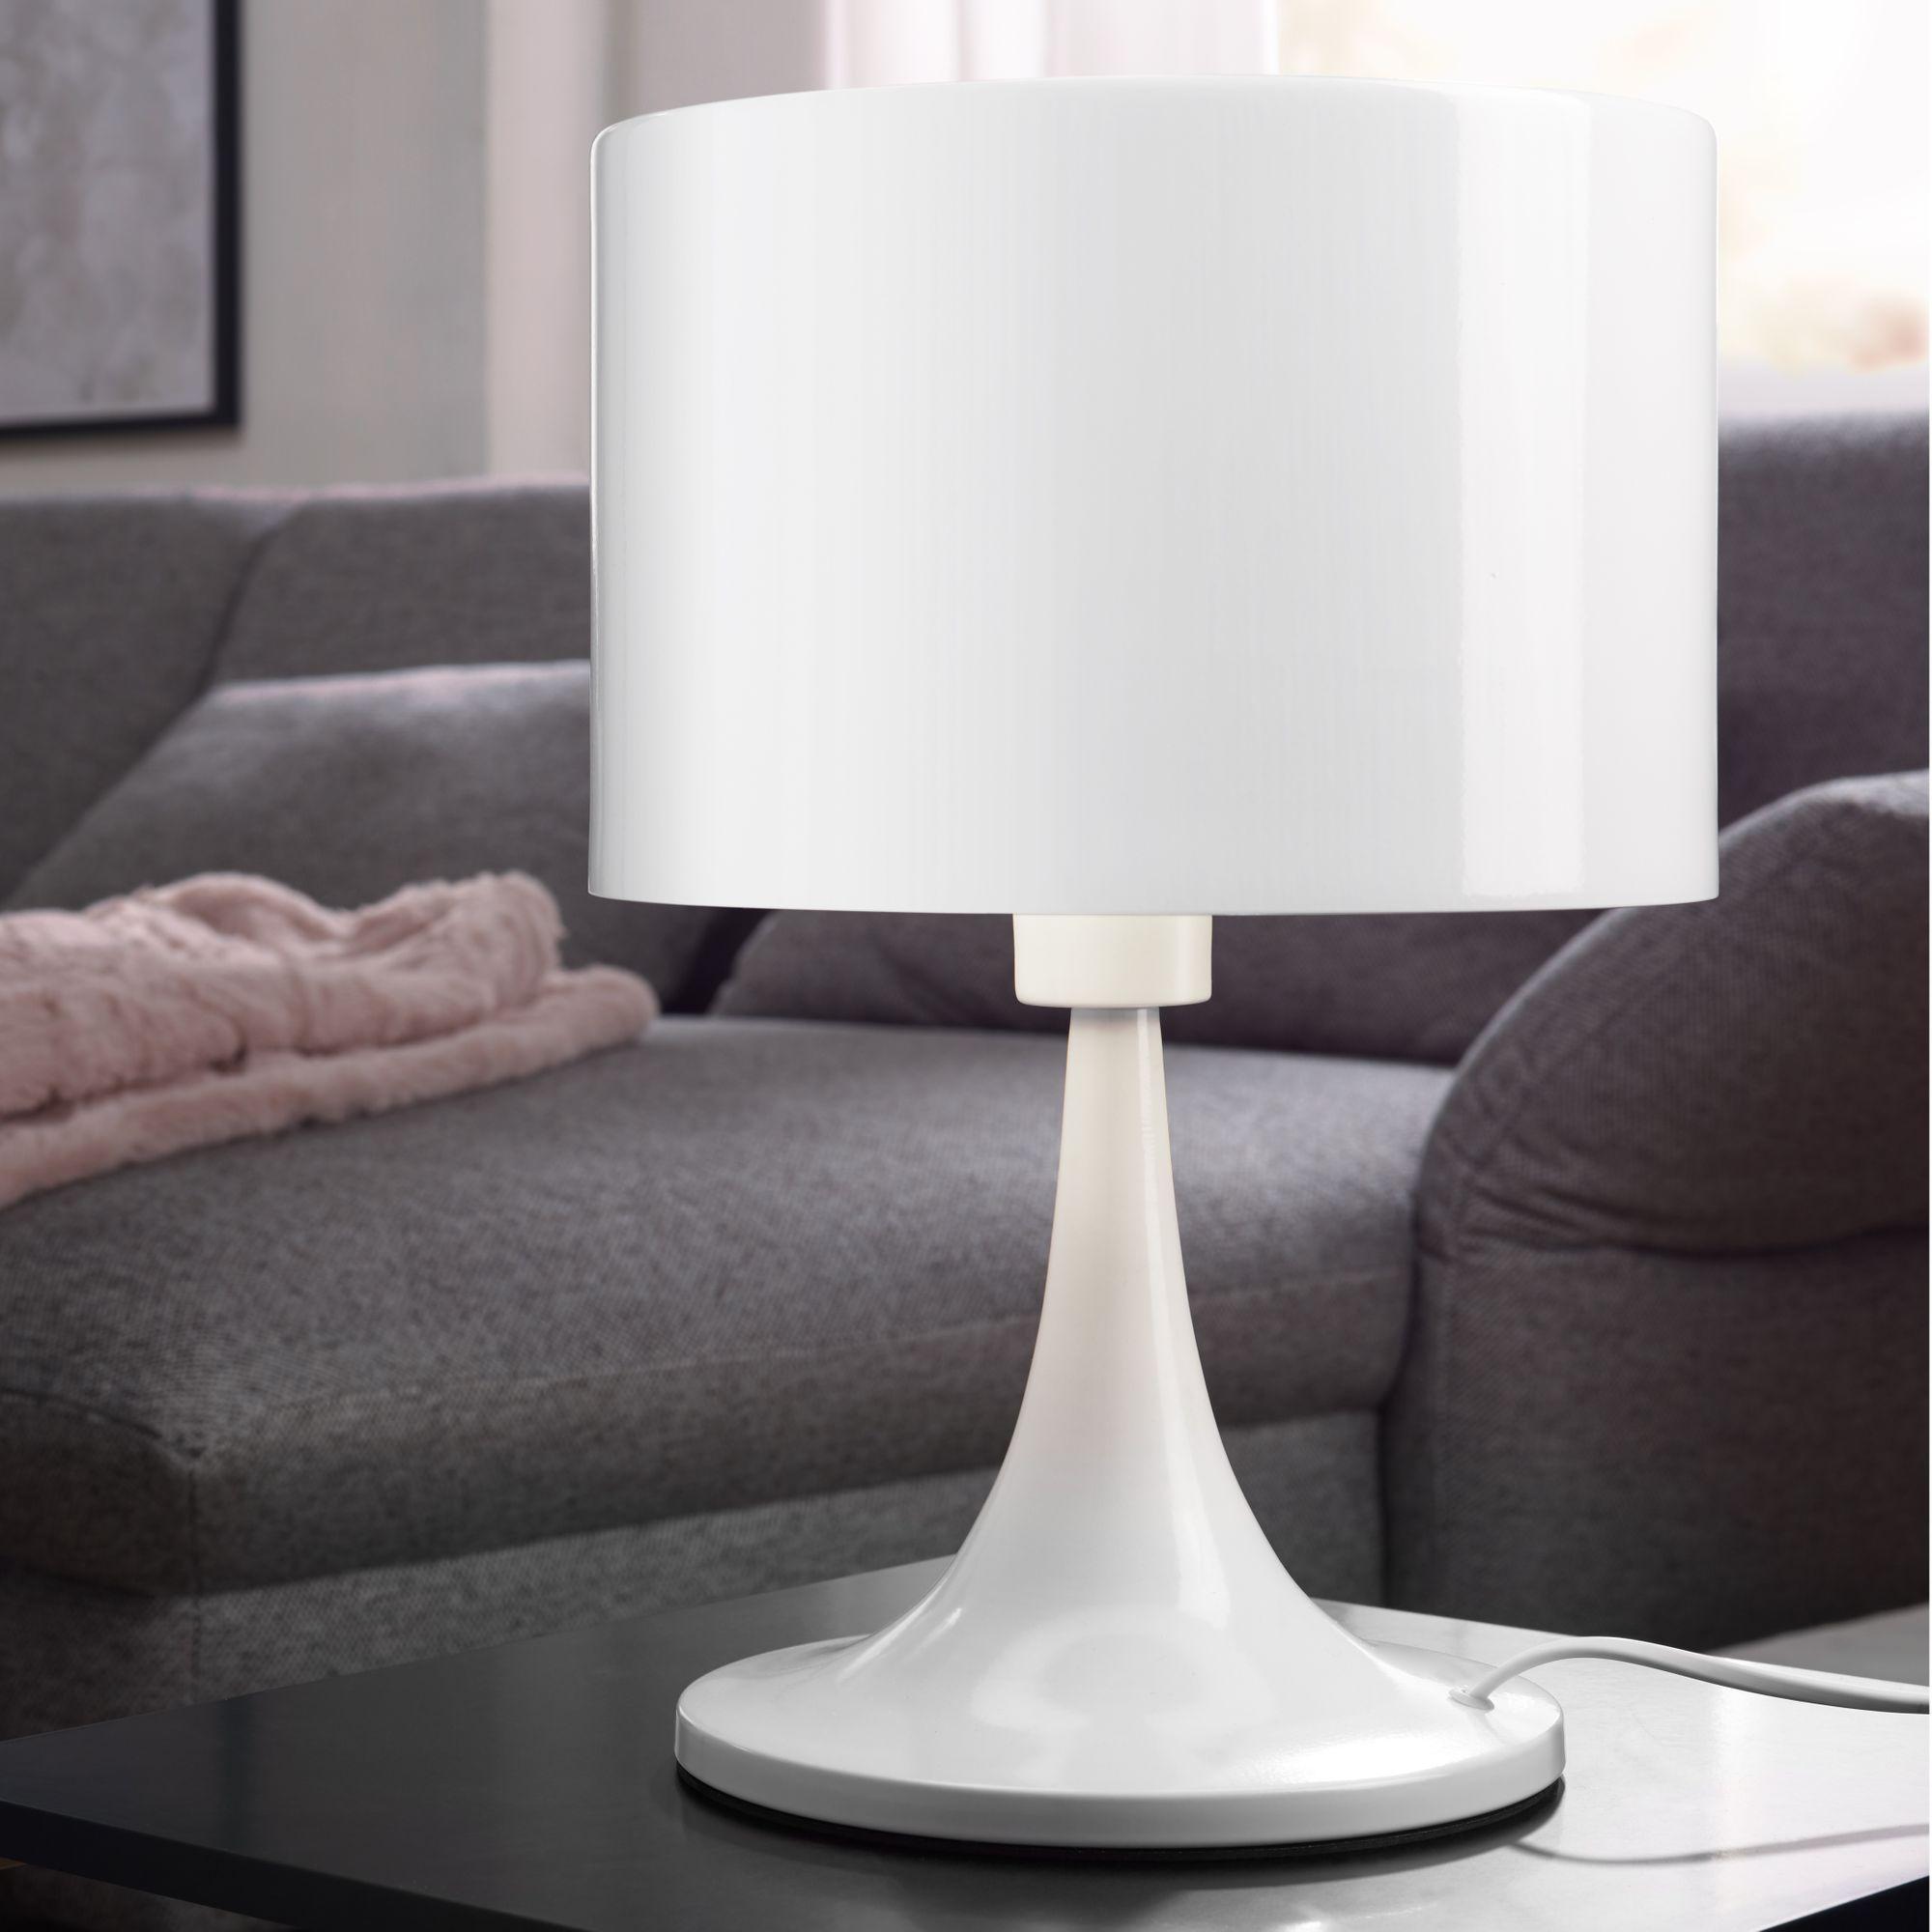 Full Size of Wohnzimmer Lampen Amazon Elegante Wohnzimmer Lampen Wohnzimmer Lampen Selber Bauen Höffner Wohnzimmer Lampen Wohnzimmer Wohnzimmer Lampen